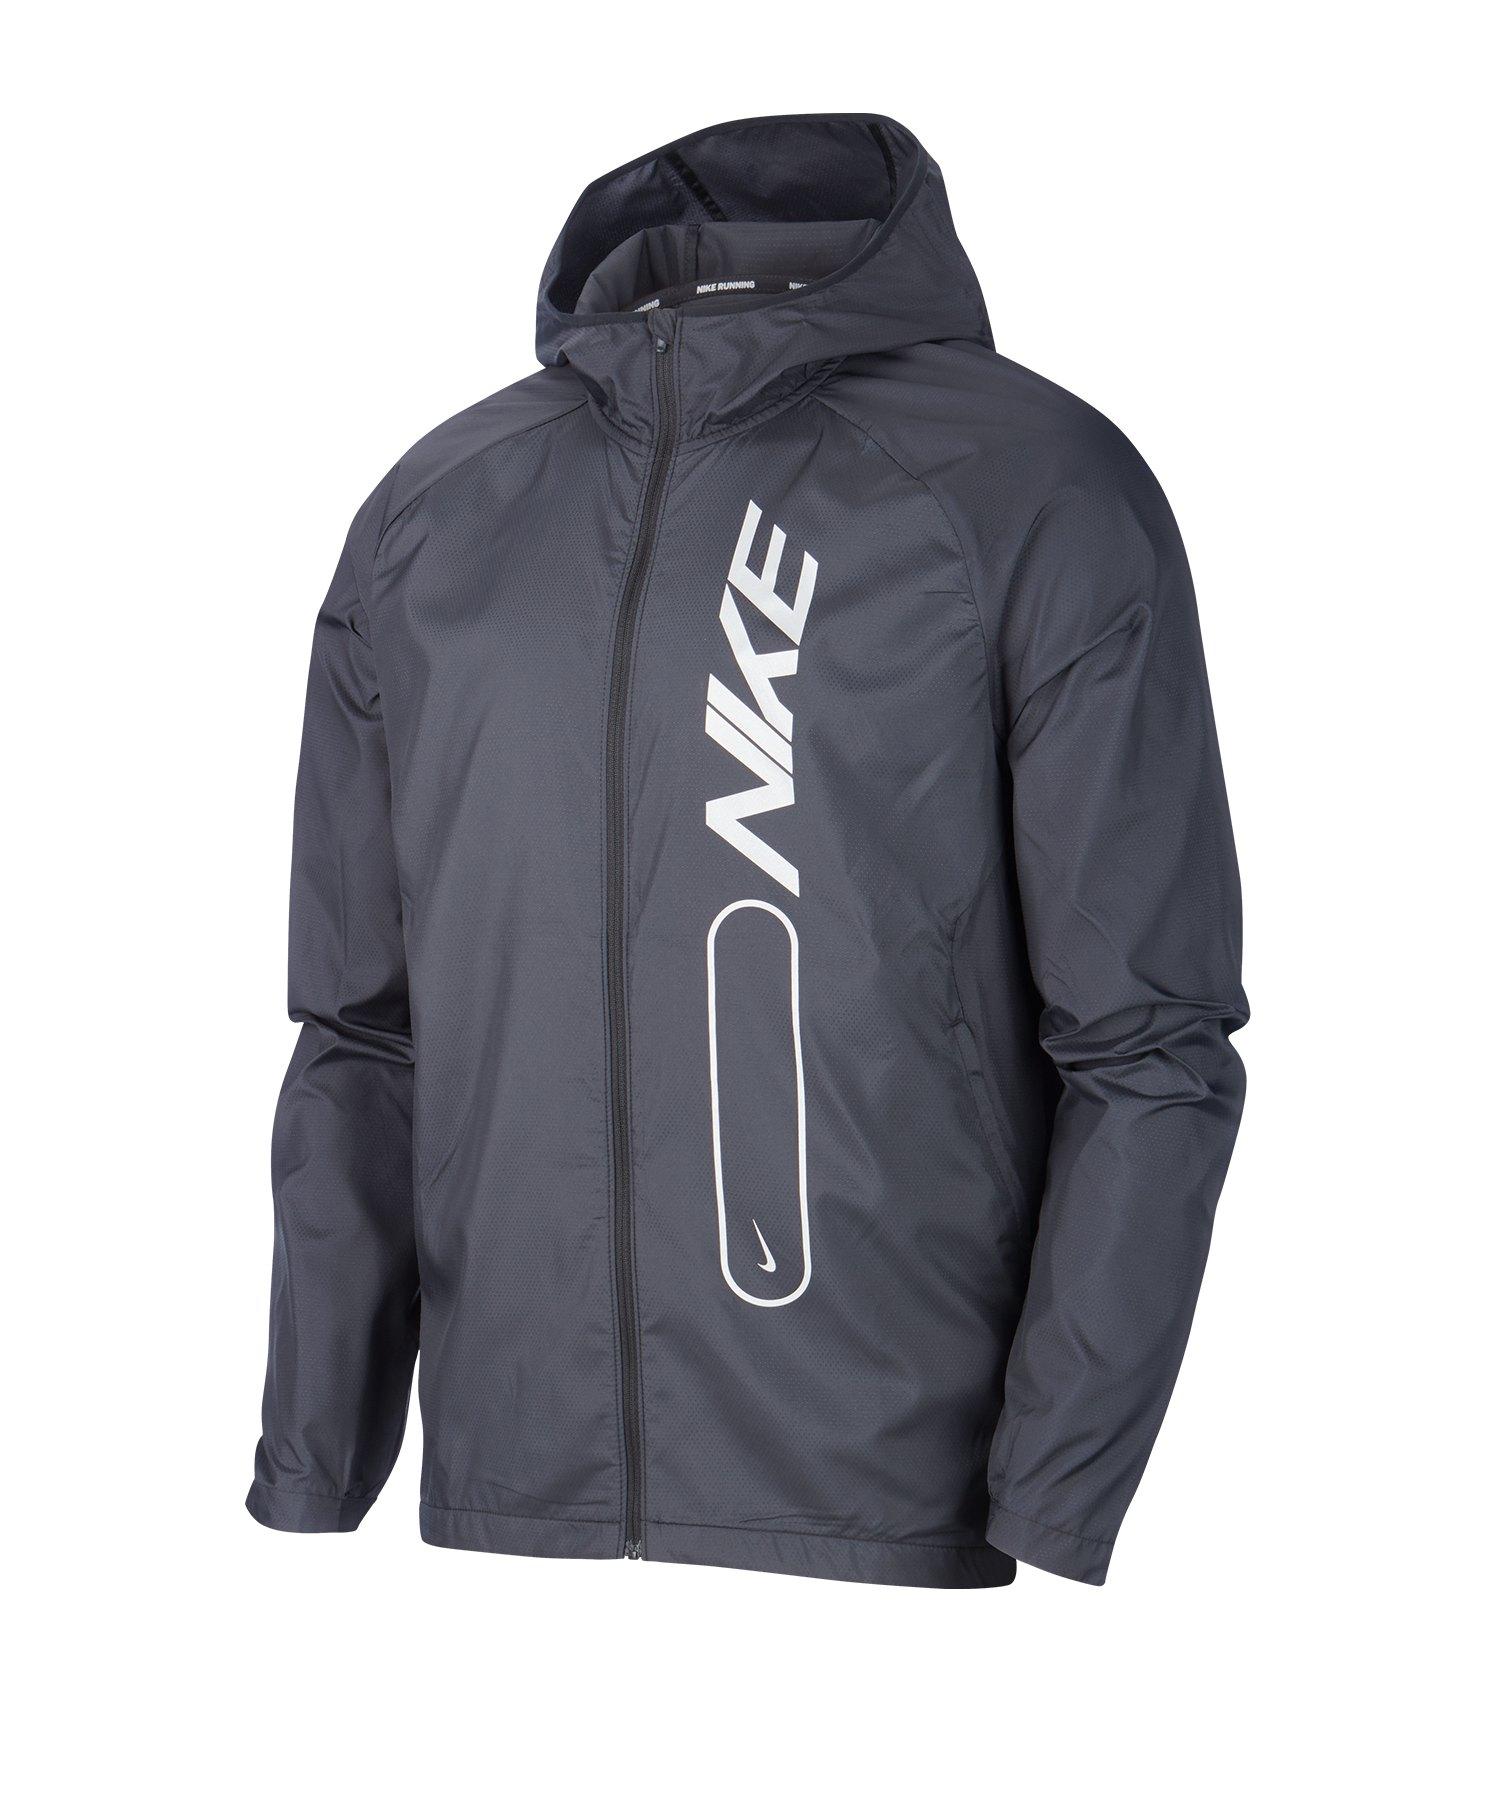 Nike Essential Running Kapuzenjacke Schwarz F010 - schwarz